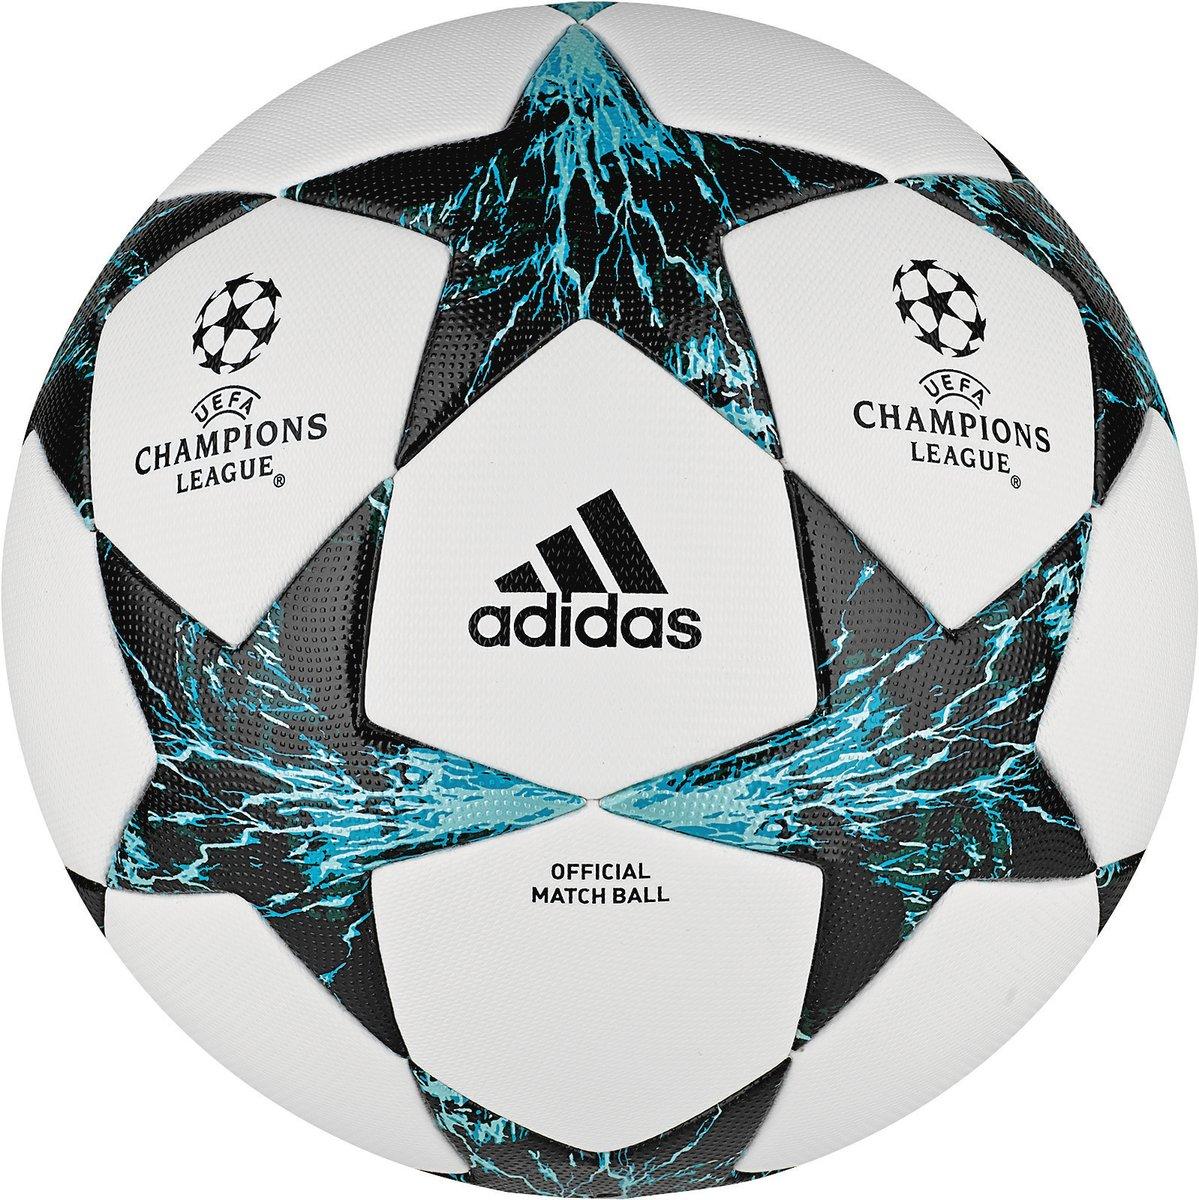 Adidas 2017-18 Champions League Ball & CL Winter Ball ...